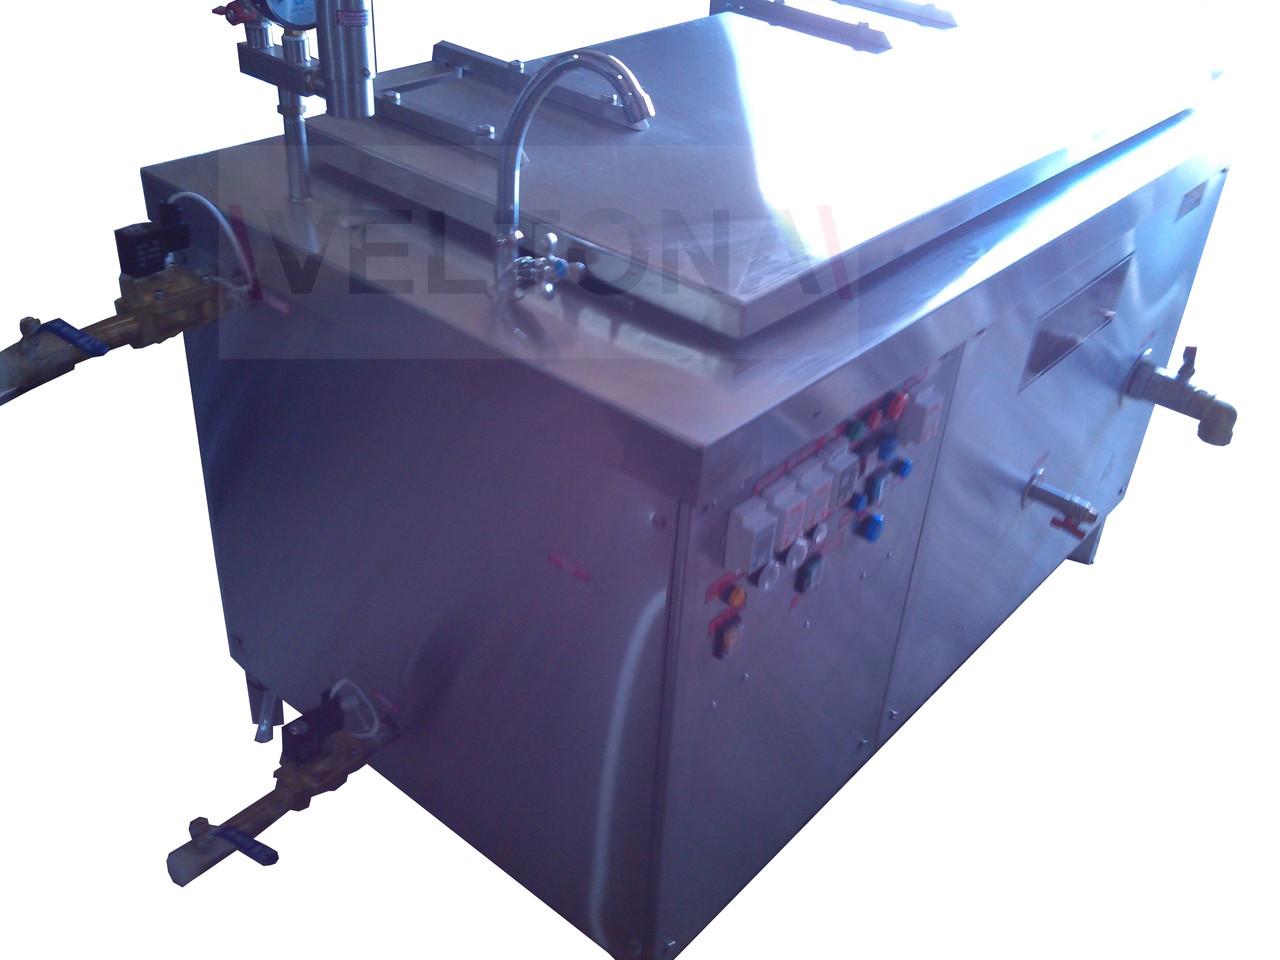 Пастеризатор с охлаждением КЭ 250 ПО с мешалкой  - SKOROVAROCHKA